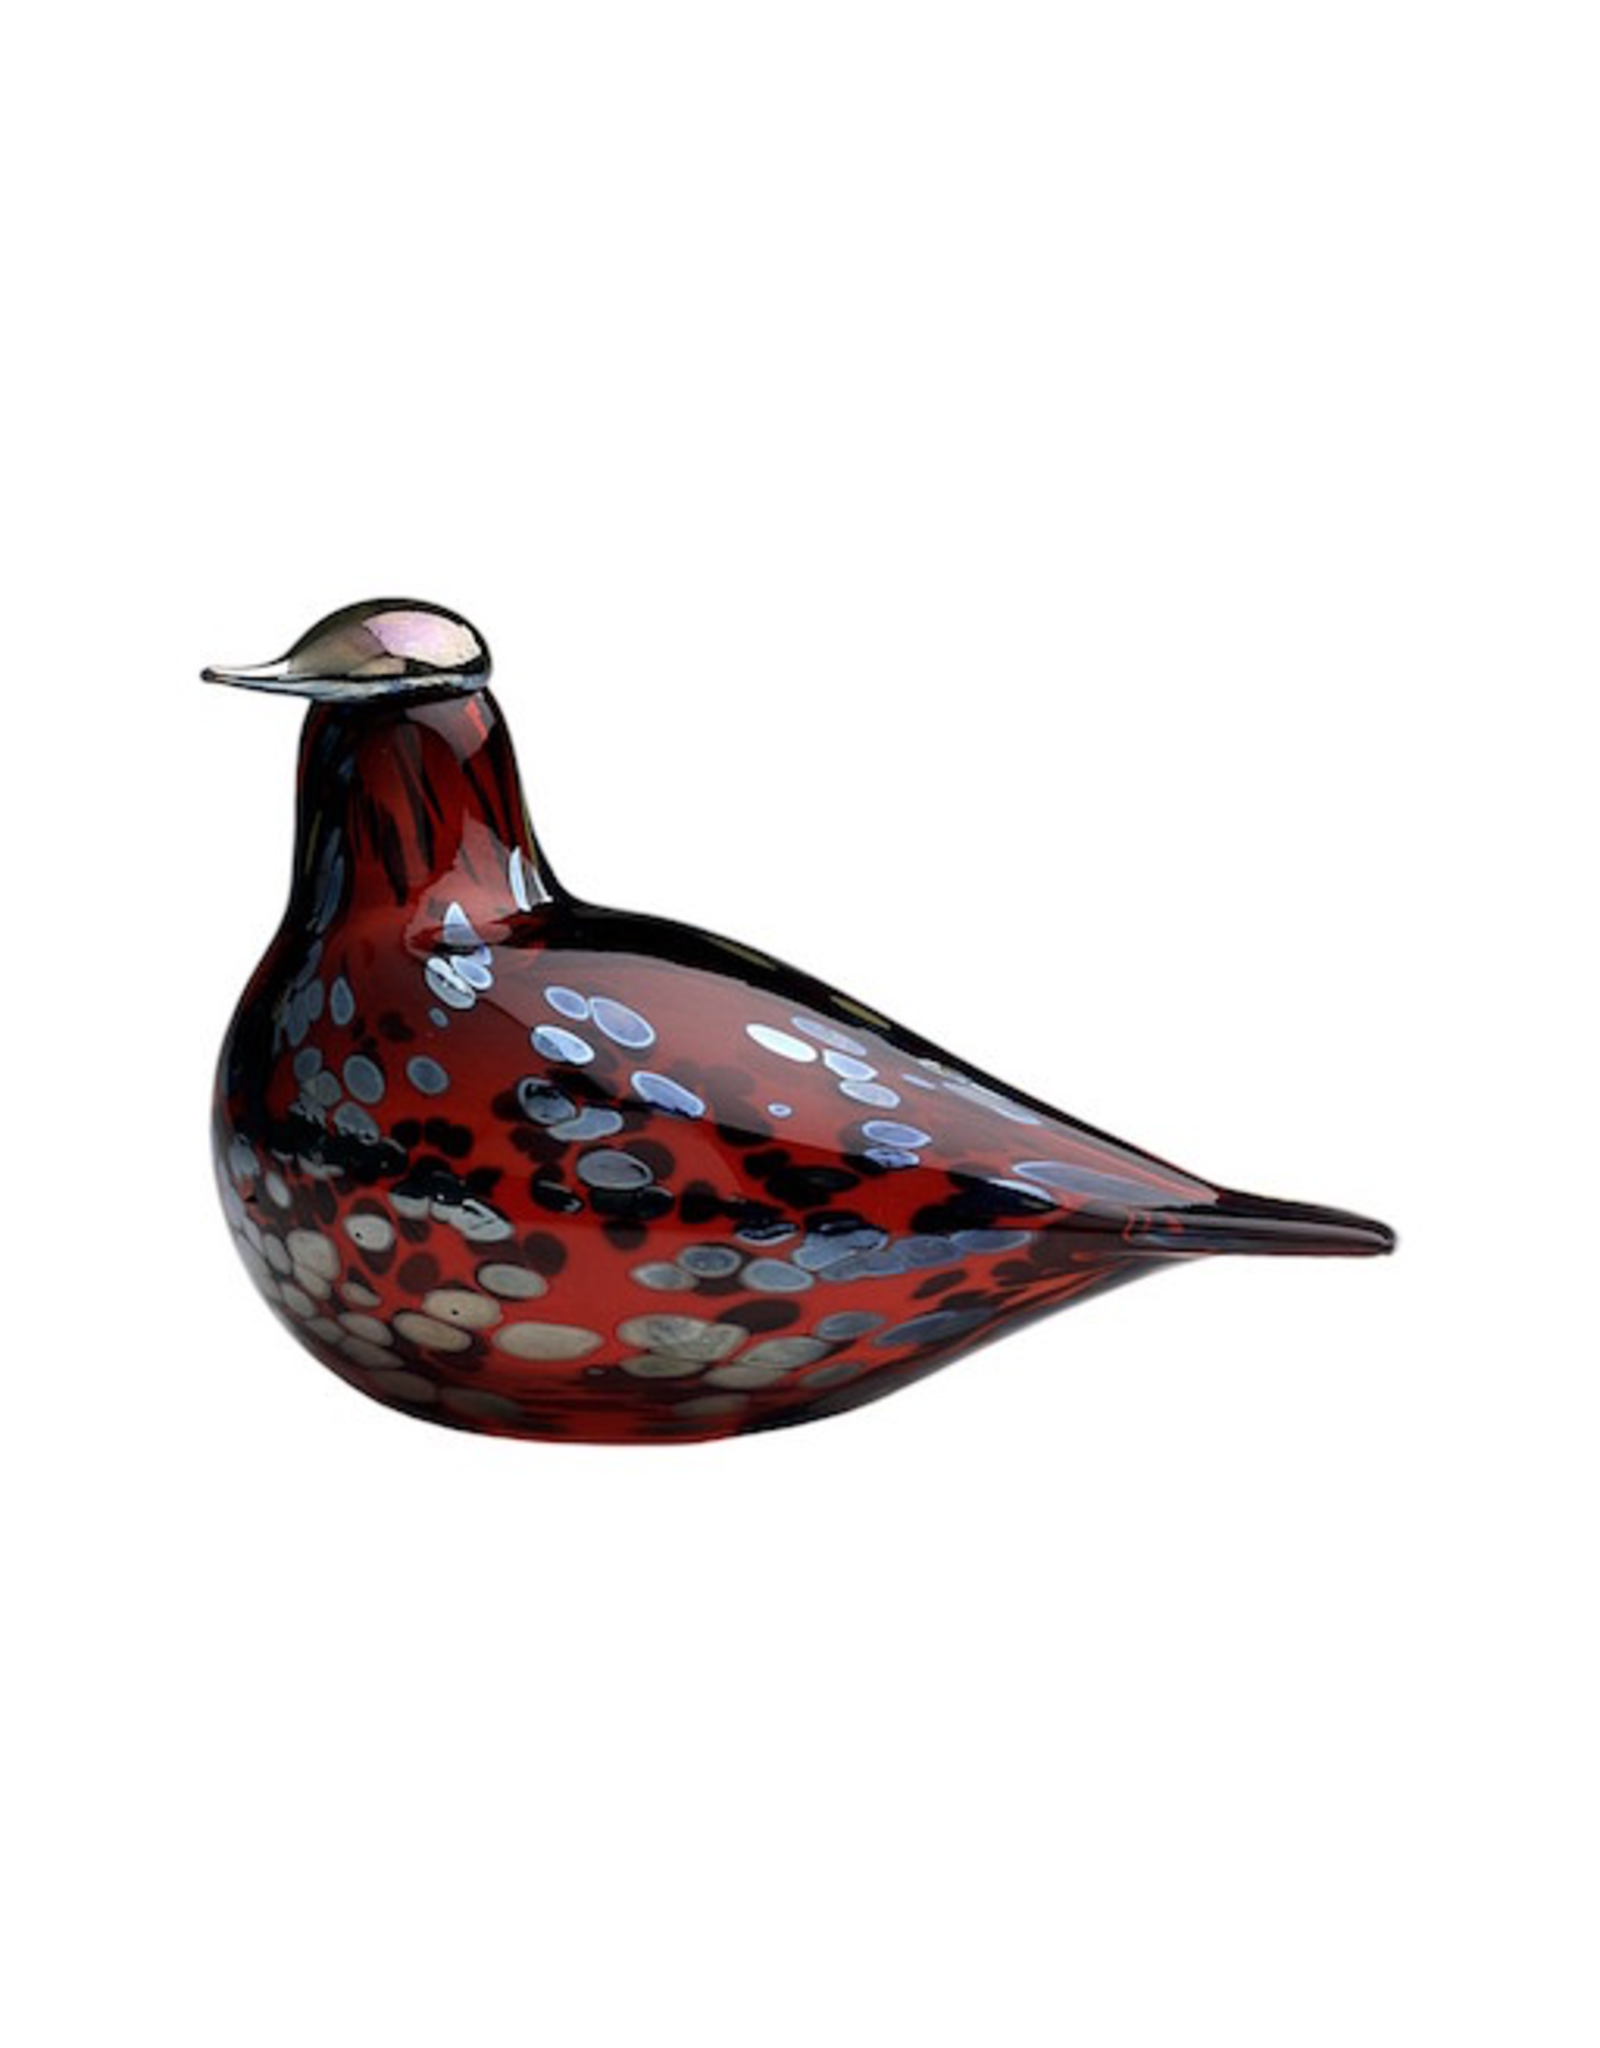 BIRDS BY TOIKKA, RUBY BIRD CRANBERRY